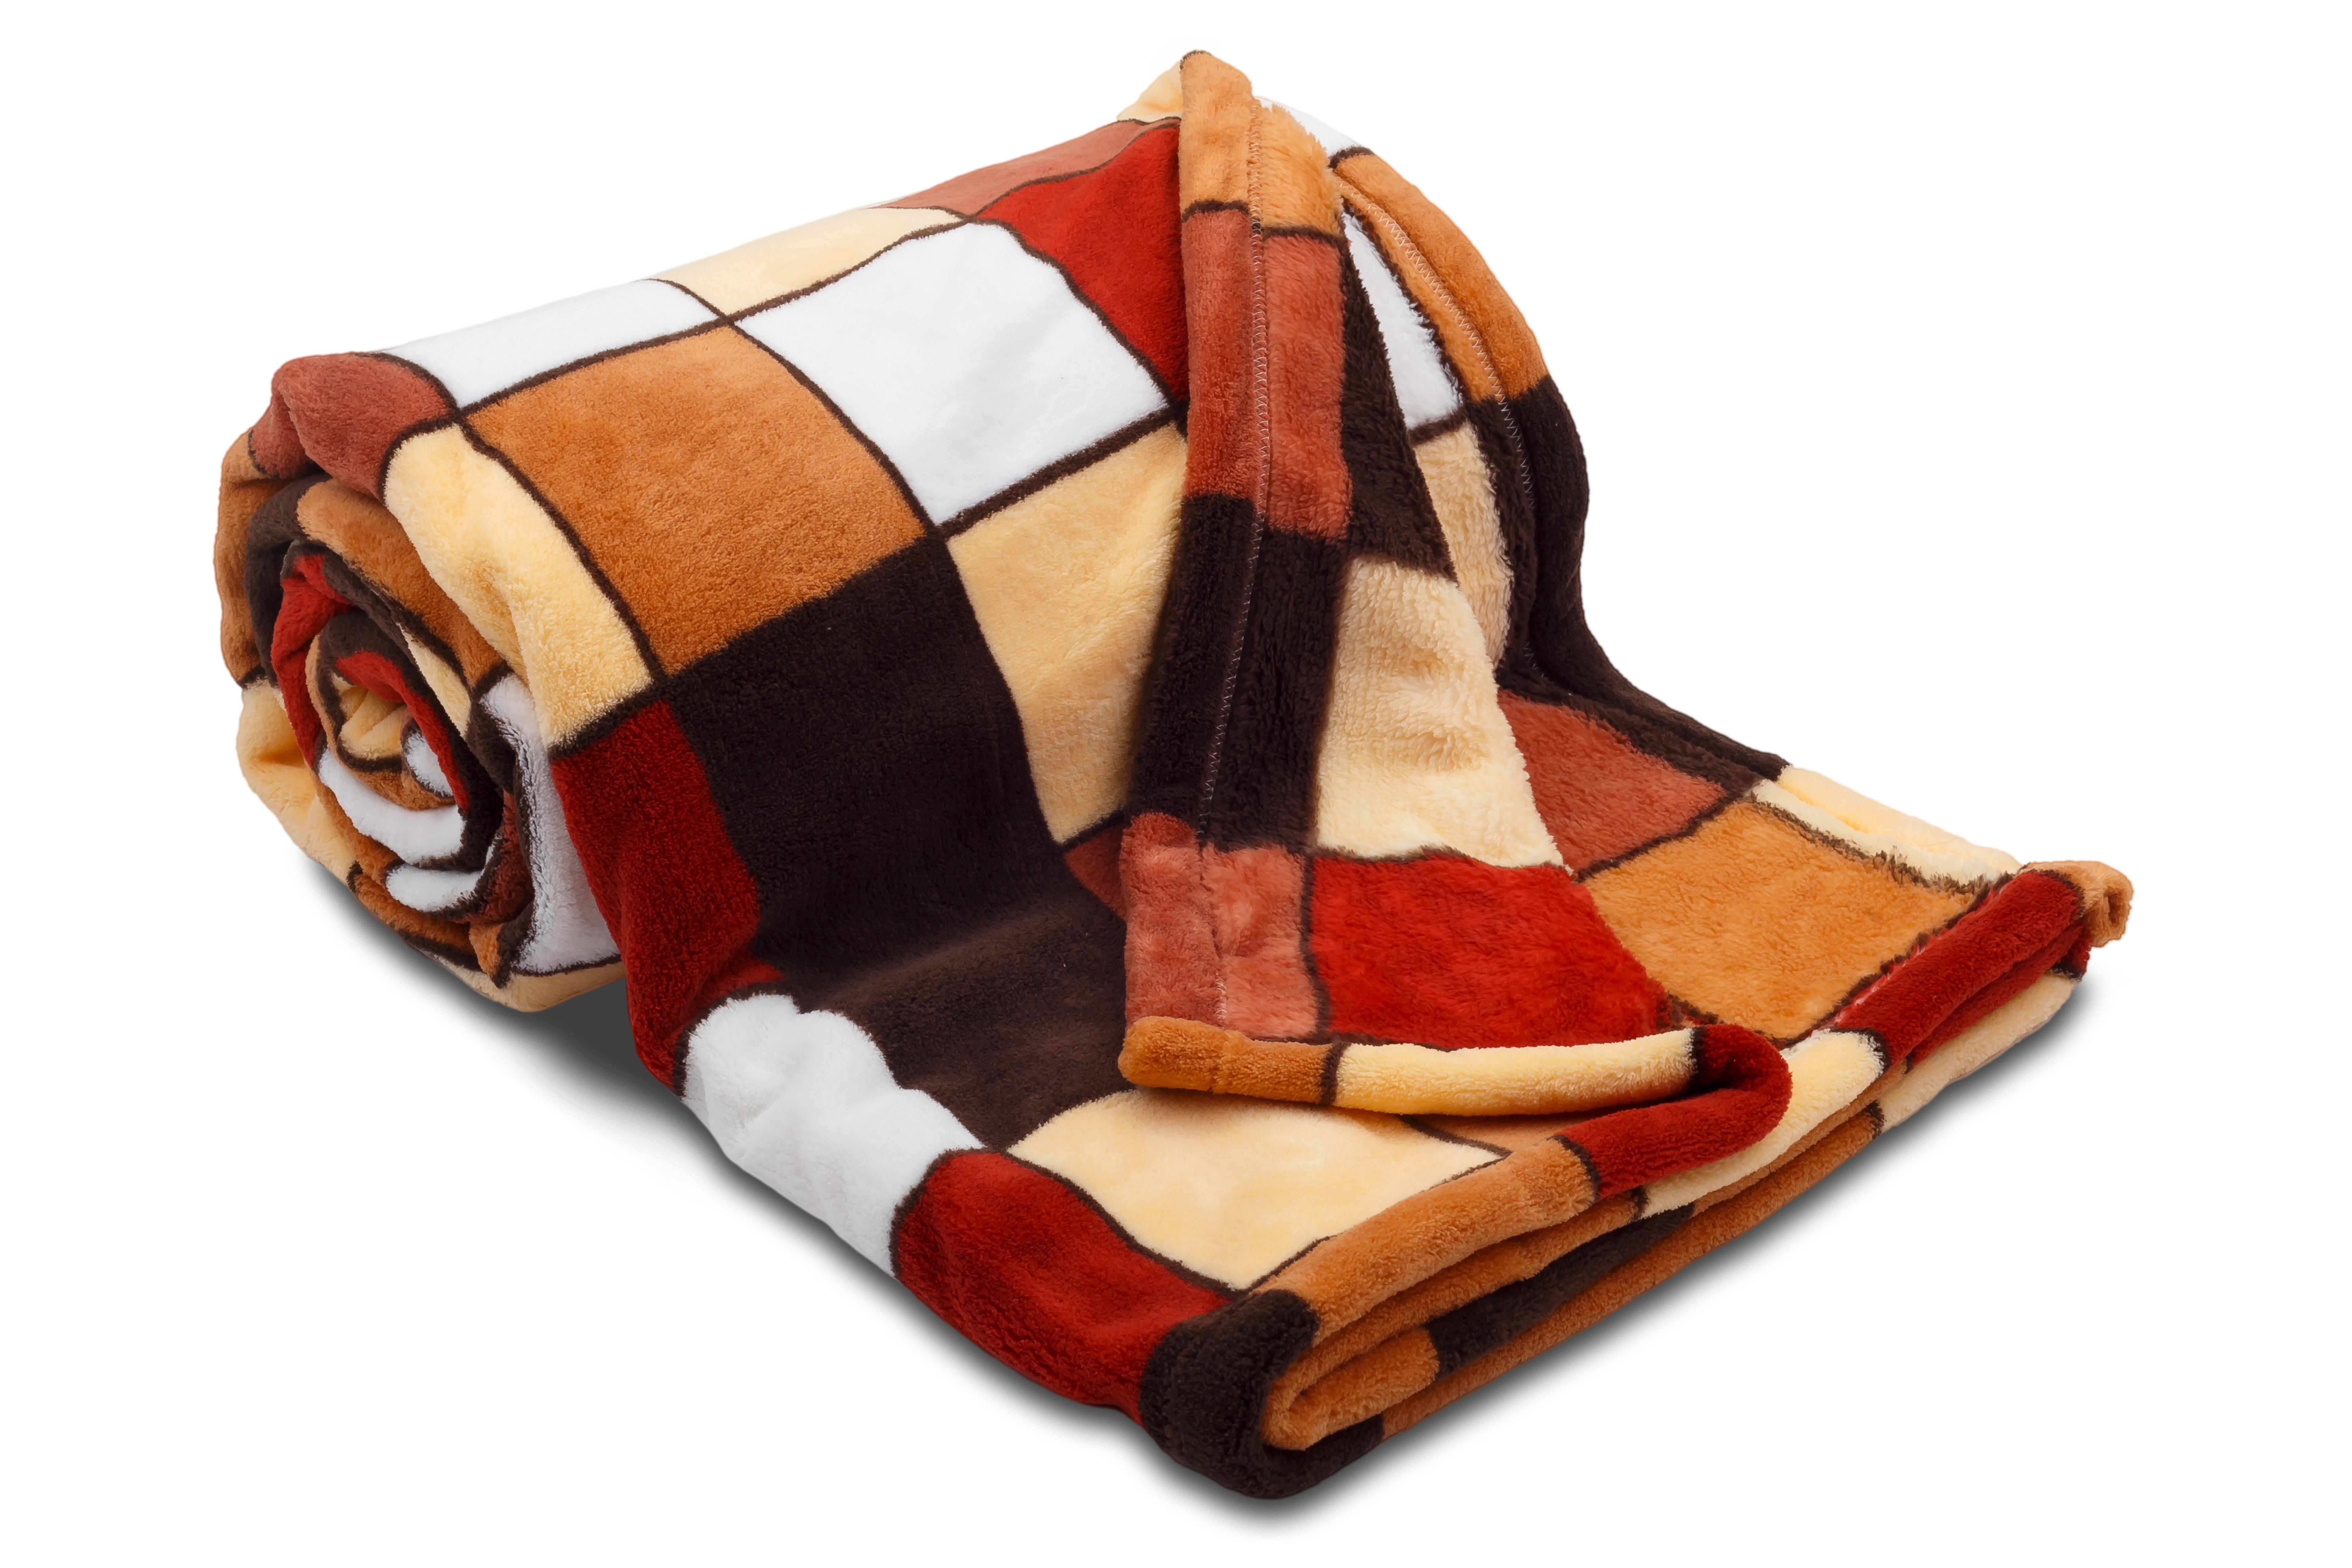 Dětská deka z mikrovlákna SLEEP WELL® 75 x 100cm - KOSTKA HNĚDÁ